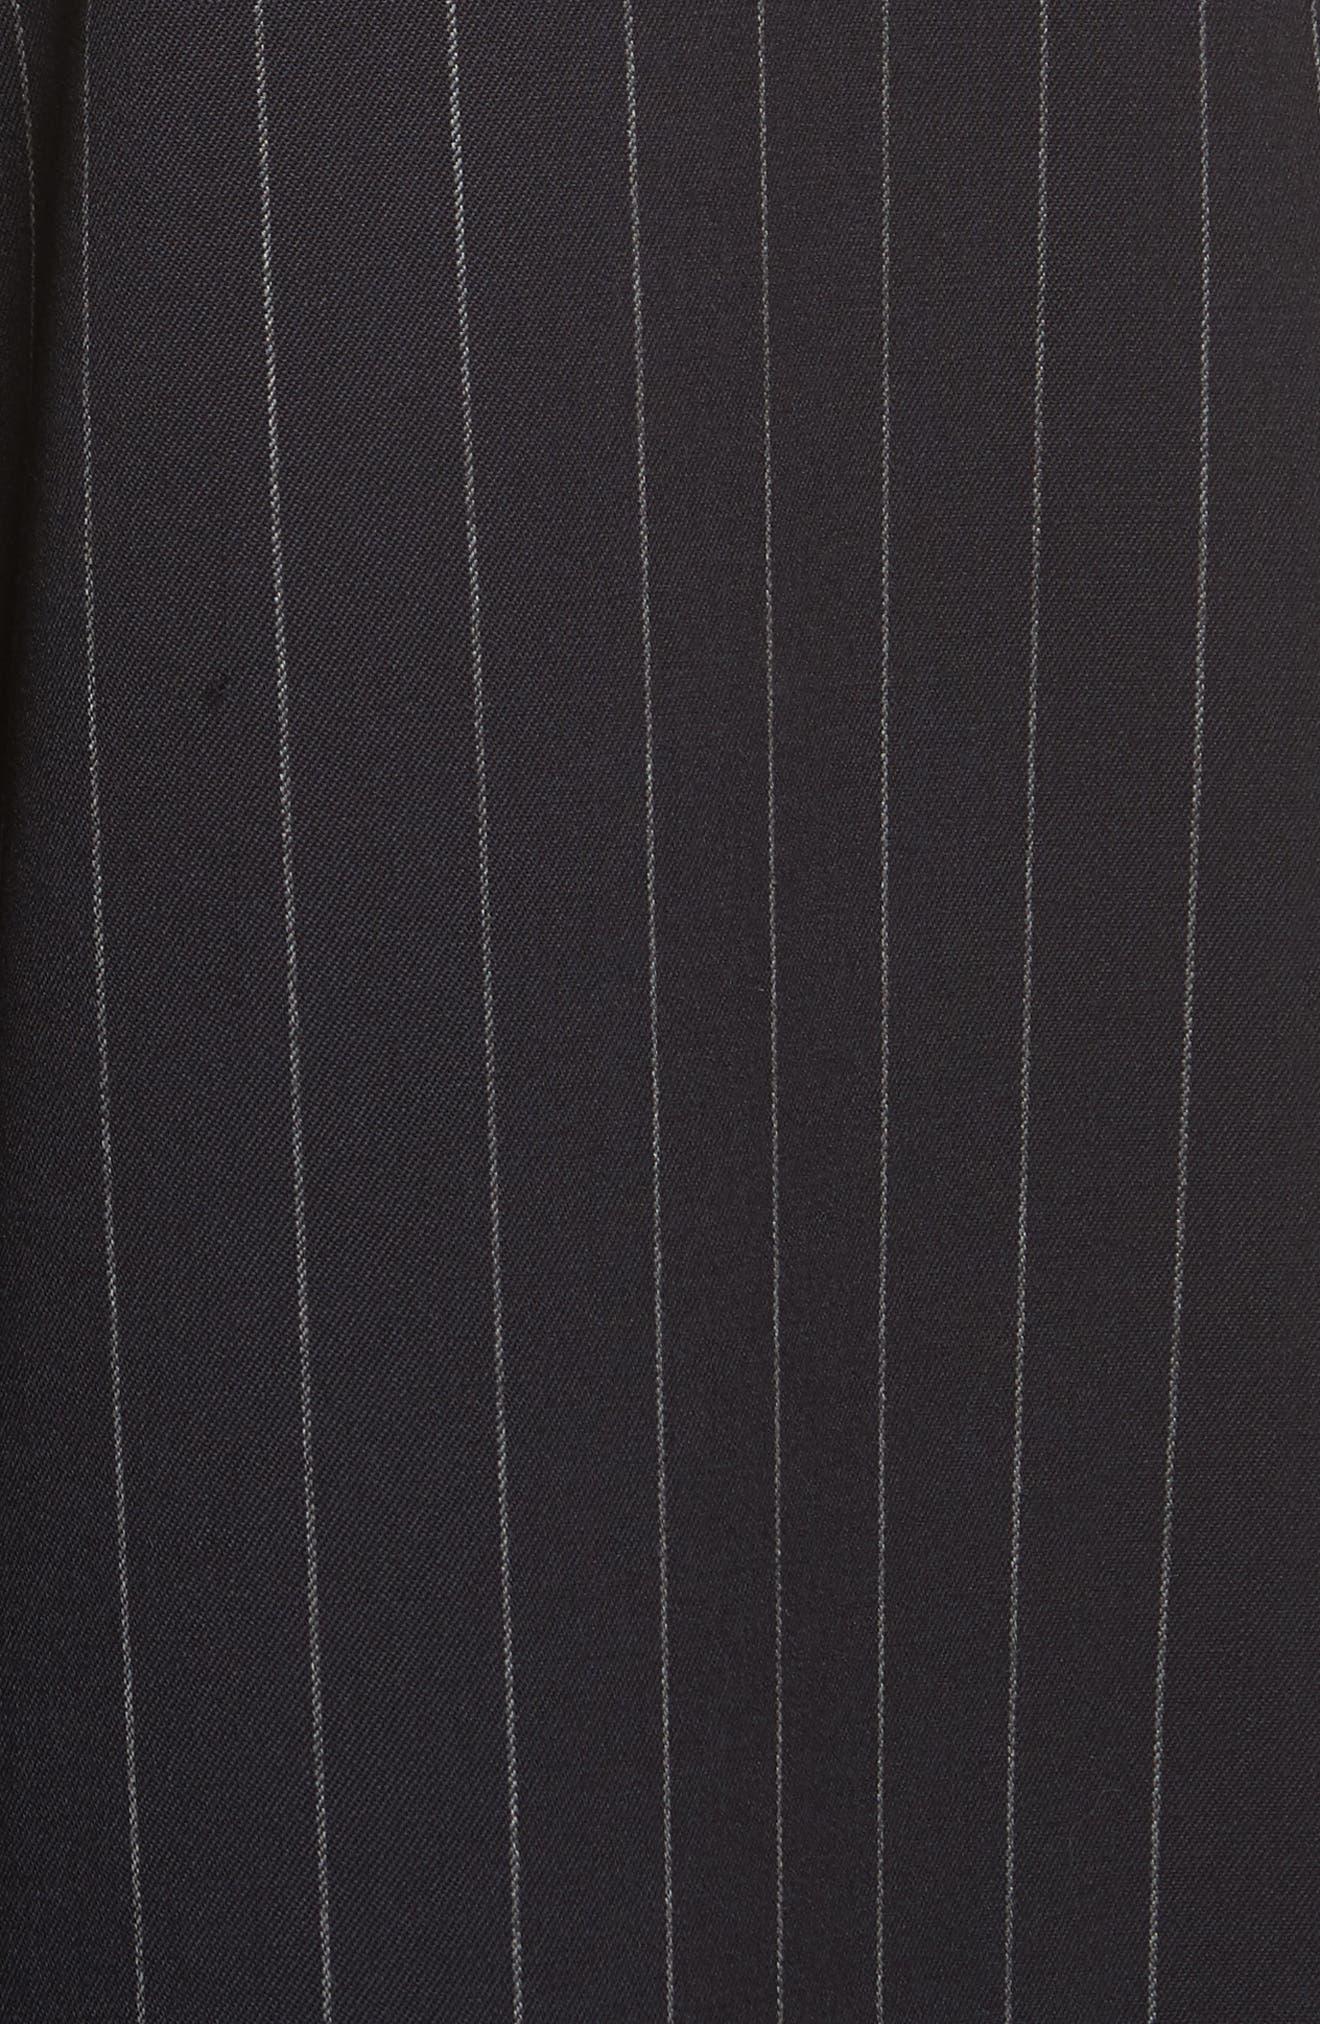 Diane Kruger x GREY Jason Wu Pinstripe Palazzo Pants,                             Alternate thumbnail 5, color,                             421